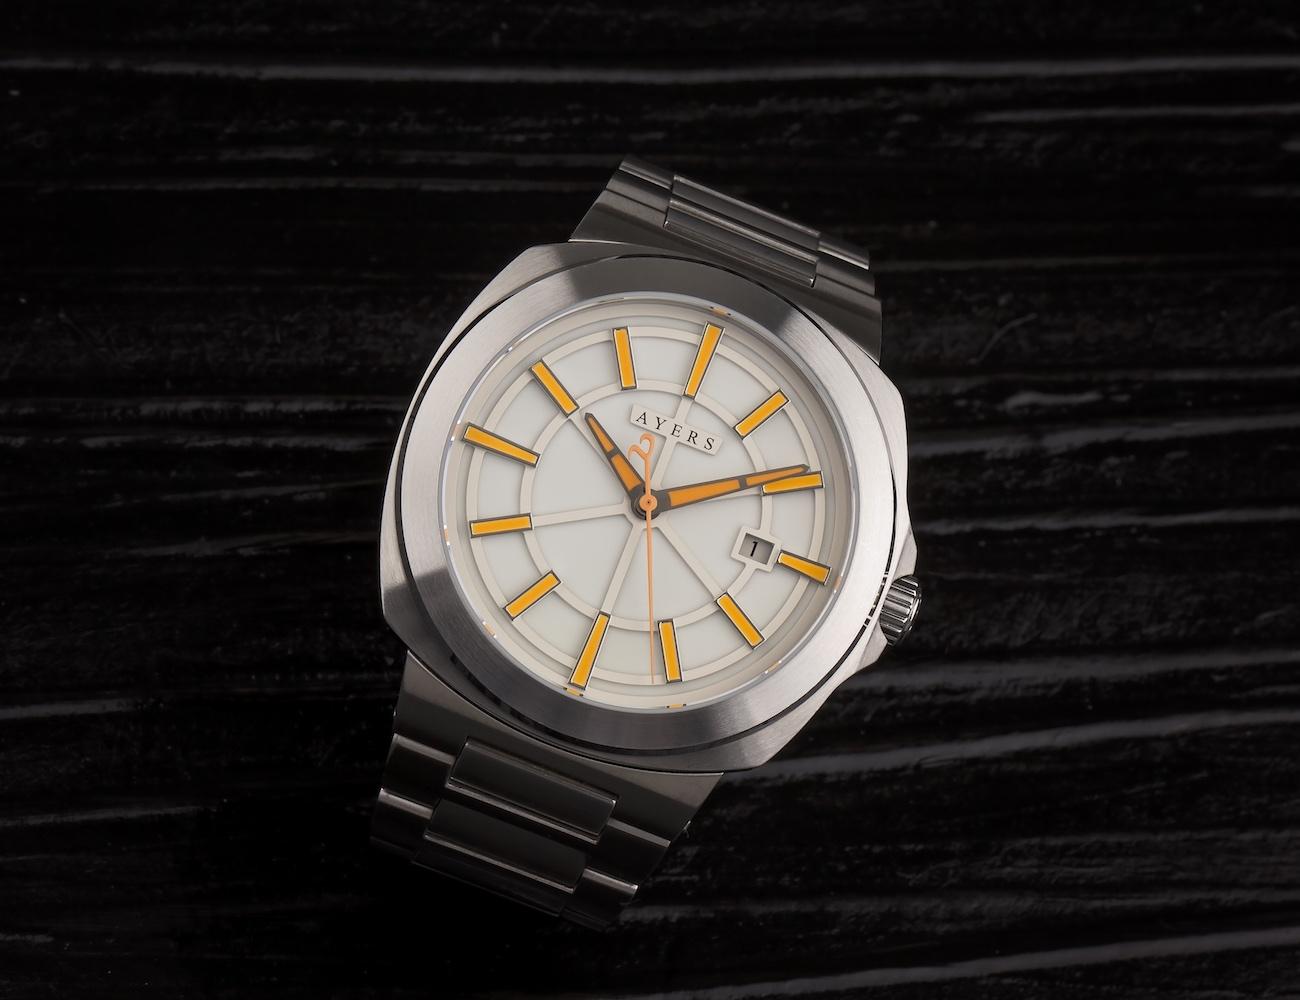 Ayers Watches Metropolitan Premium Automatic Watch